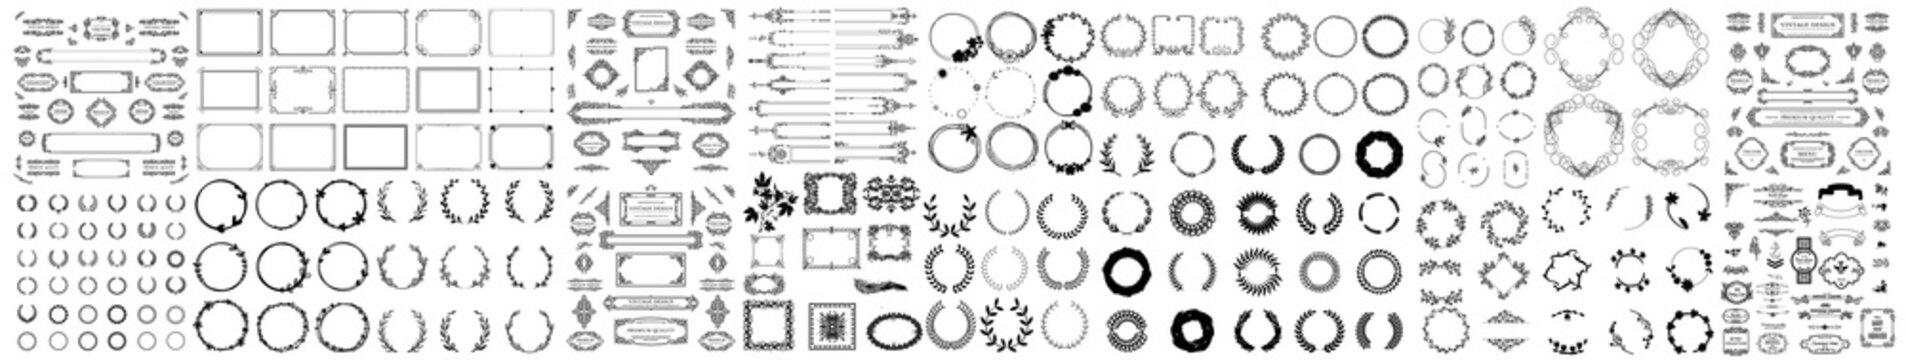 Big set with wreath, design elements, frames, calligraphic. Vintage line elements. Retro design elements. Ornaments and Frames. Drawing geometrics line. Decoration,Vector set of calligraphic design